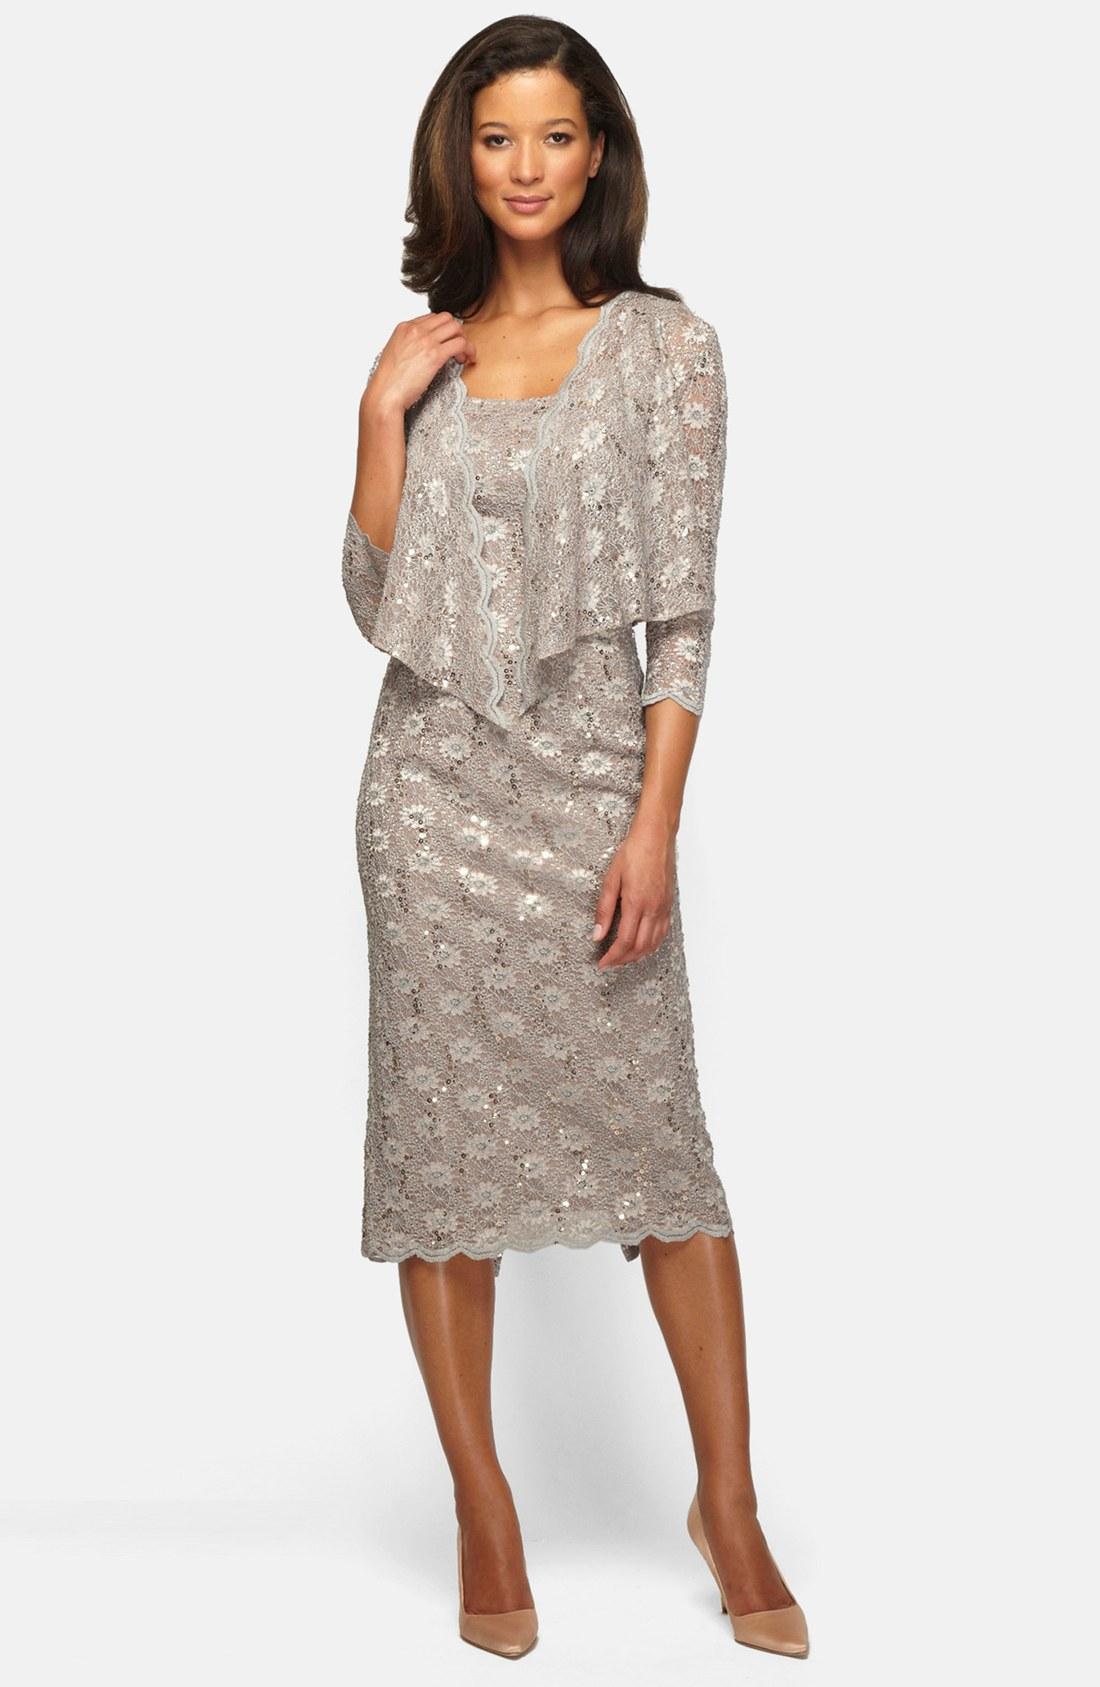 dress 2 impress jefferson valley mall